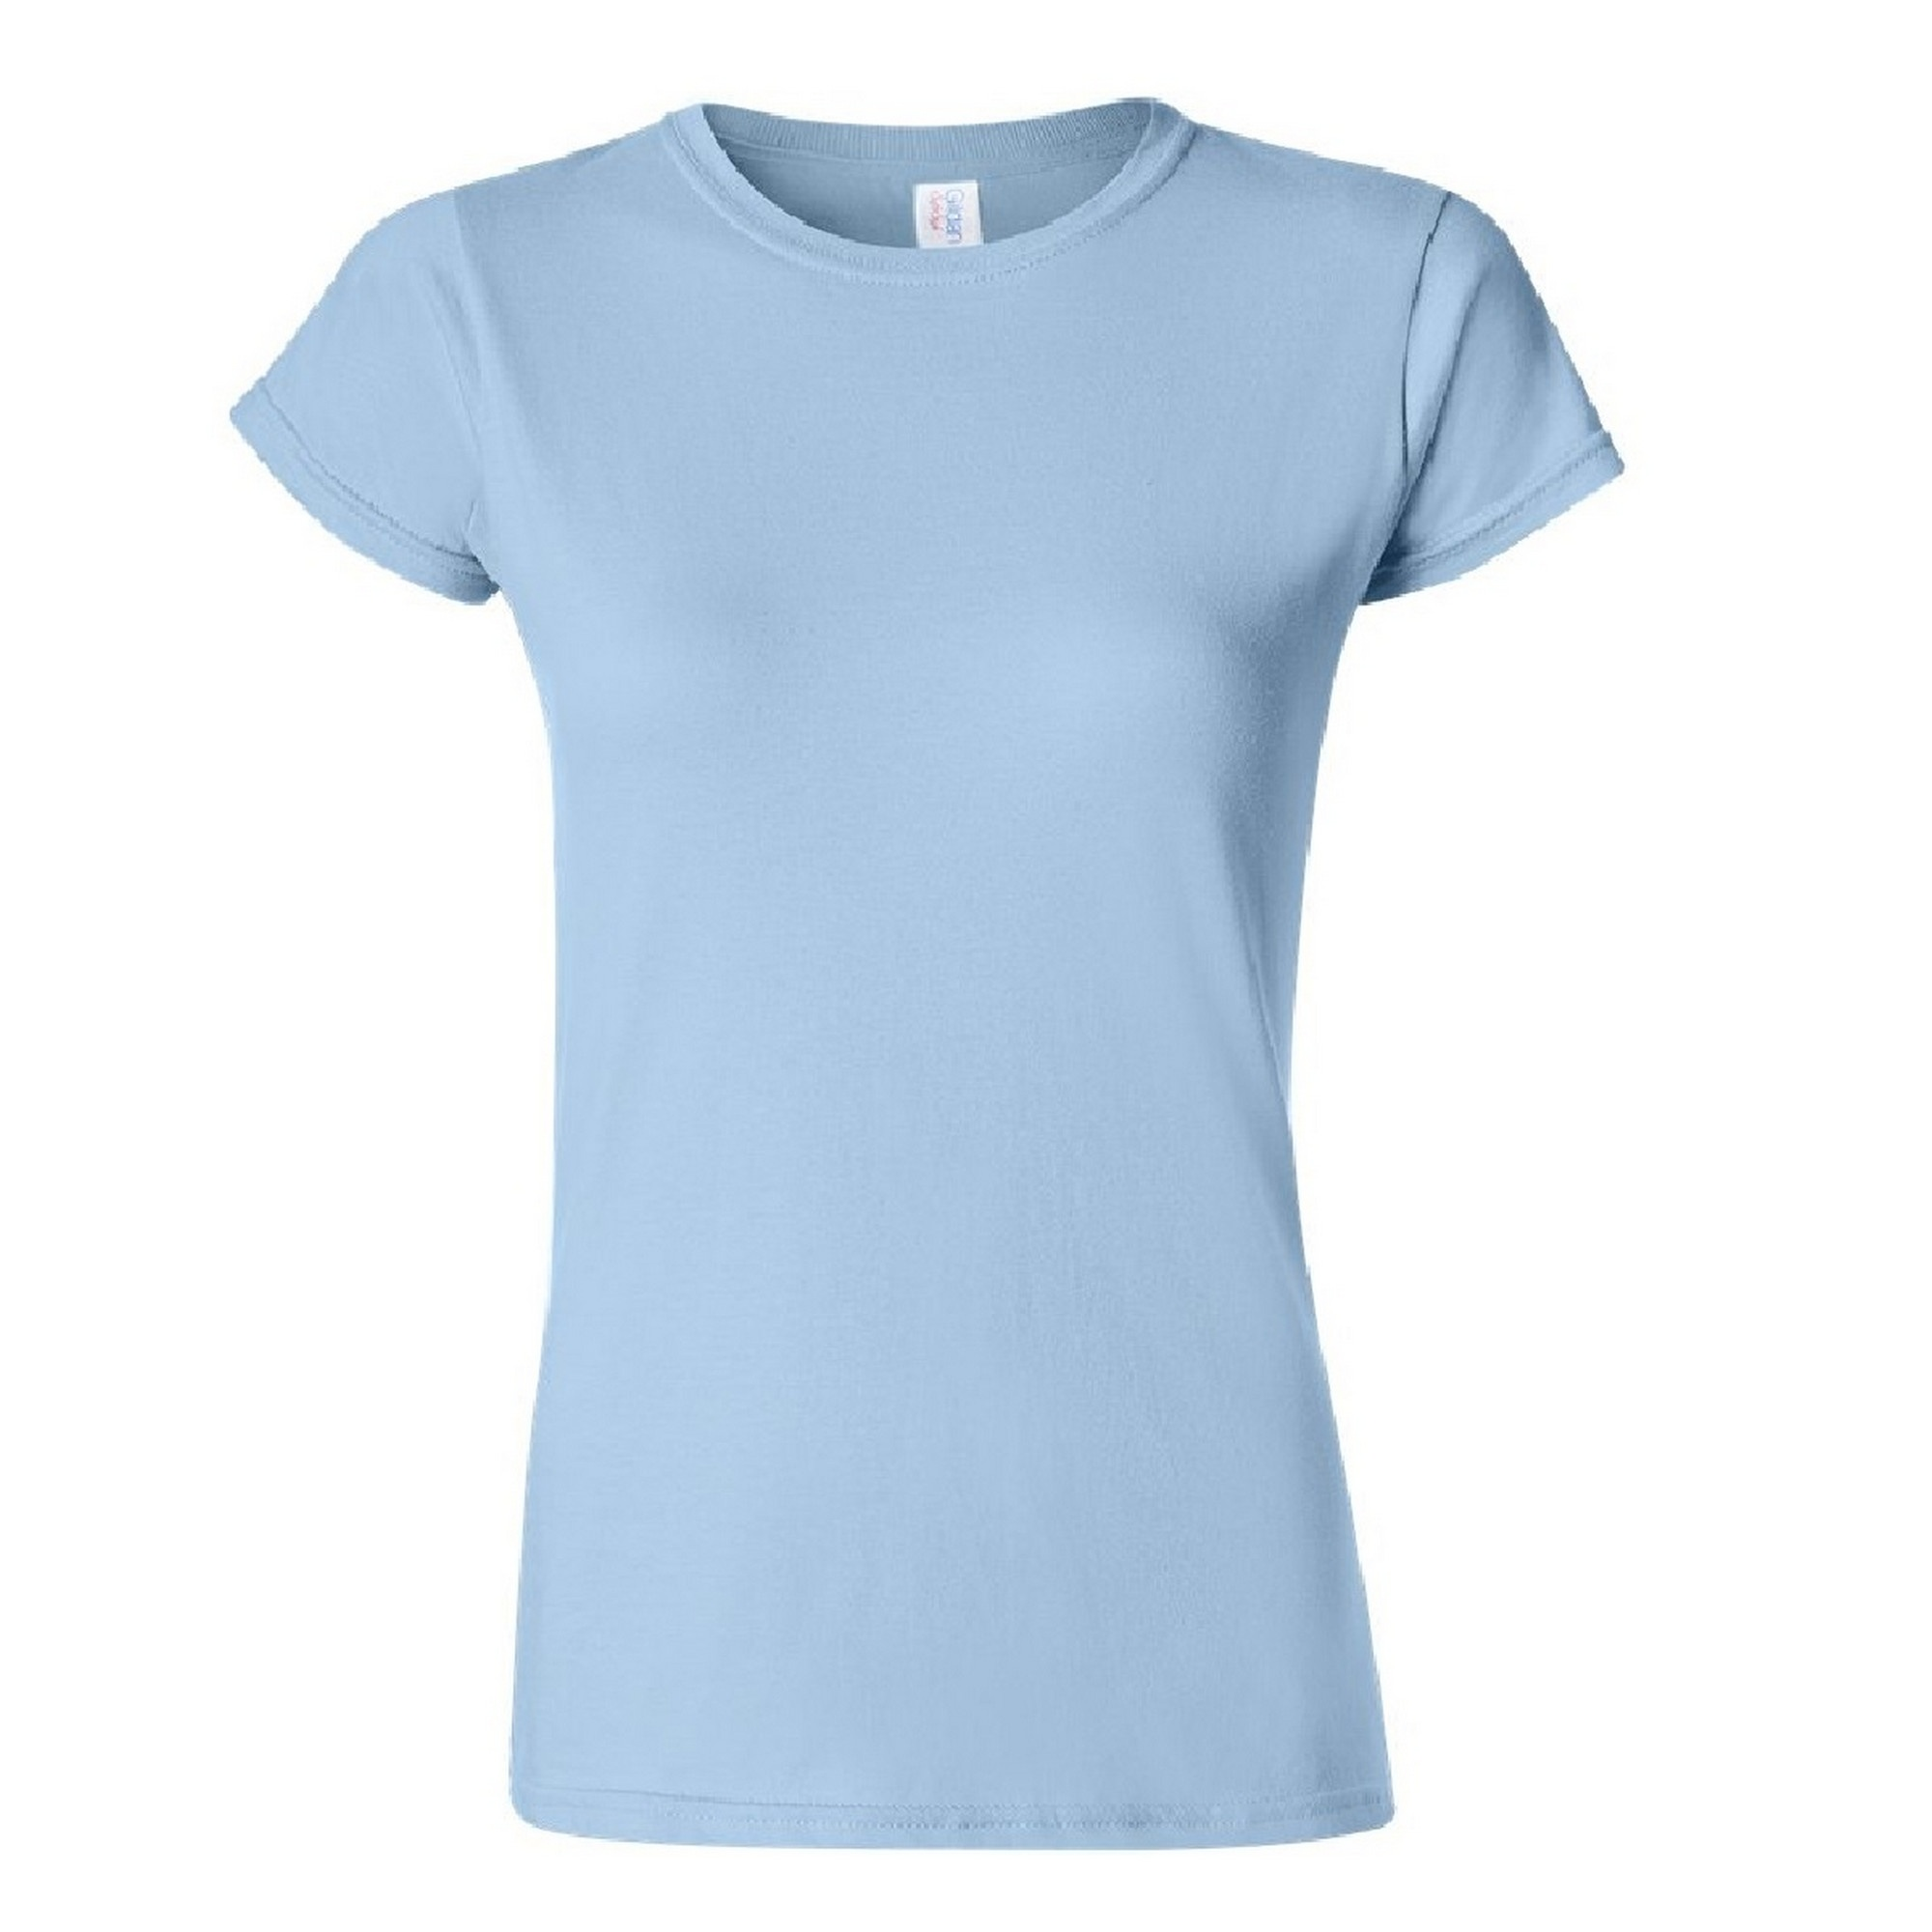 Gildan Ladies Soft Style Short Sleeve T-Shirt (L) (Light Blue)